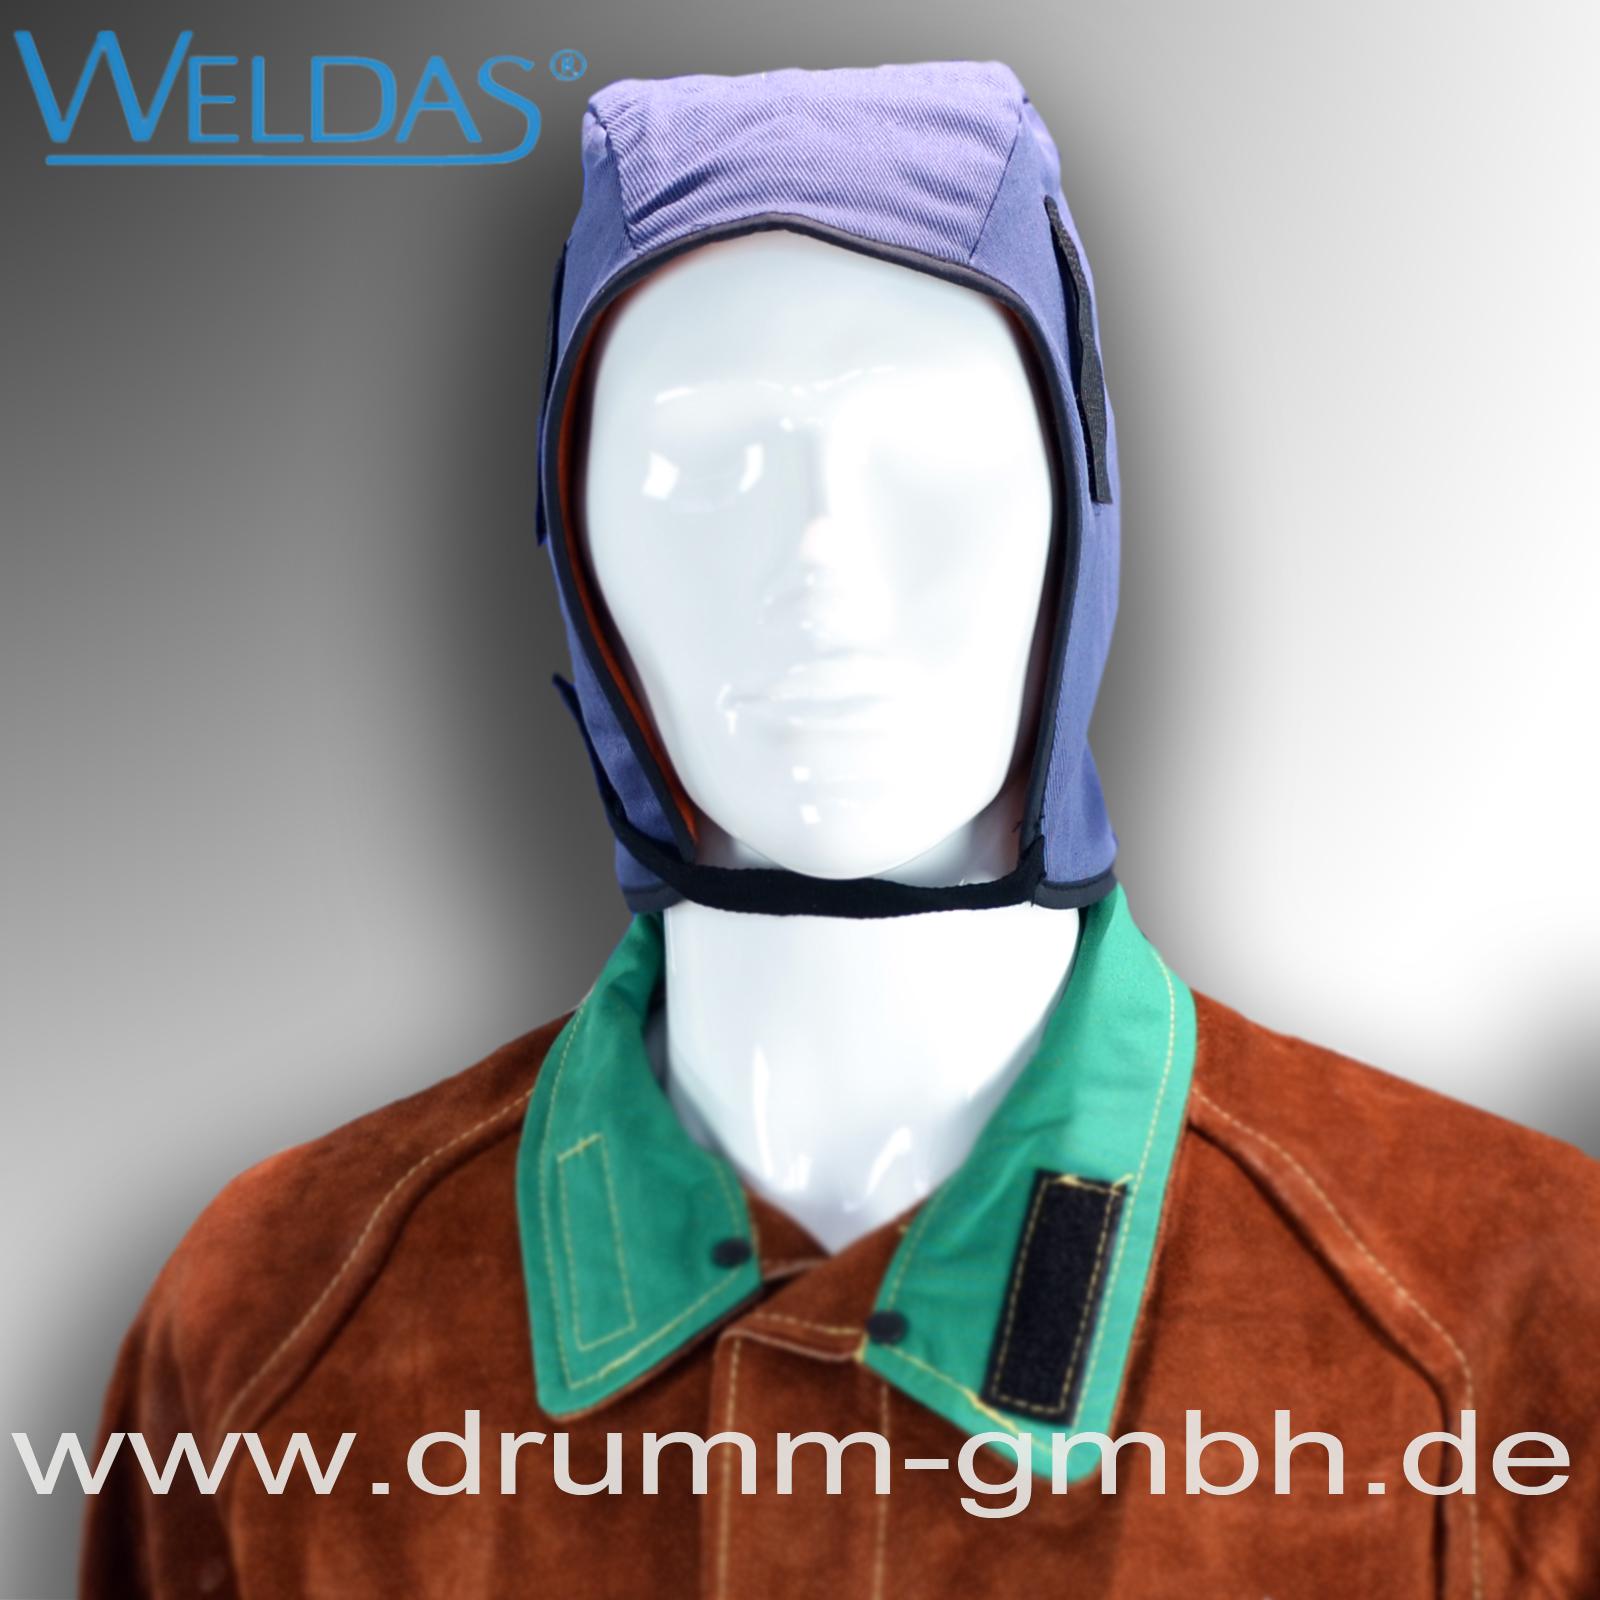 WELDAS Schweisser-Winterhaube